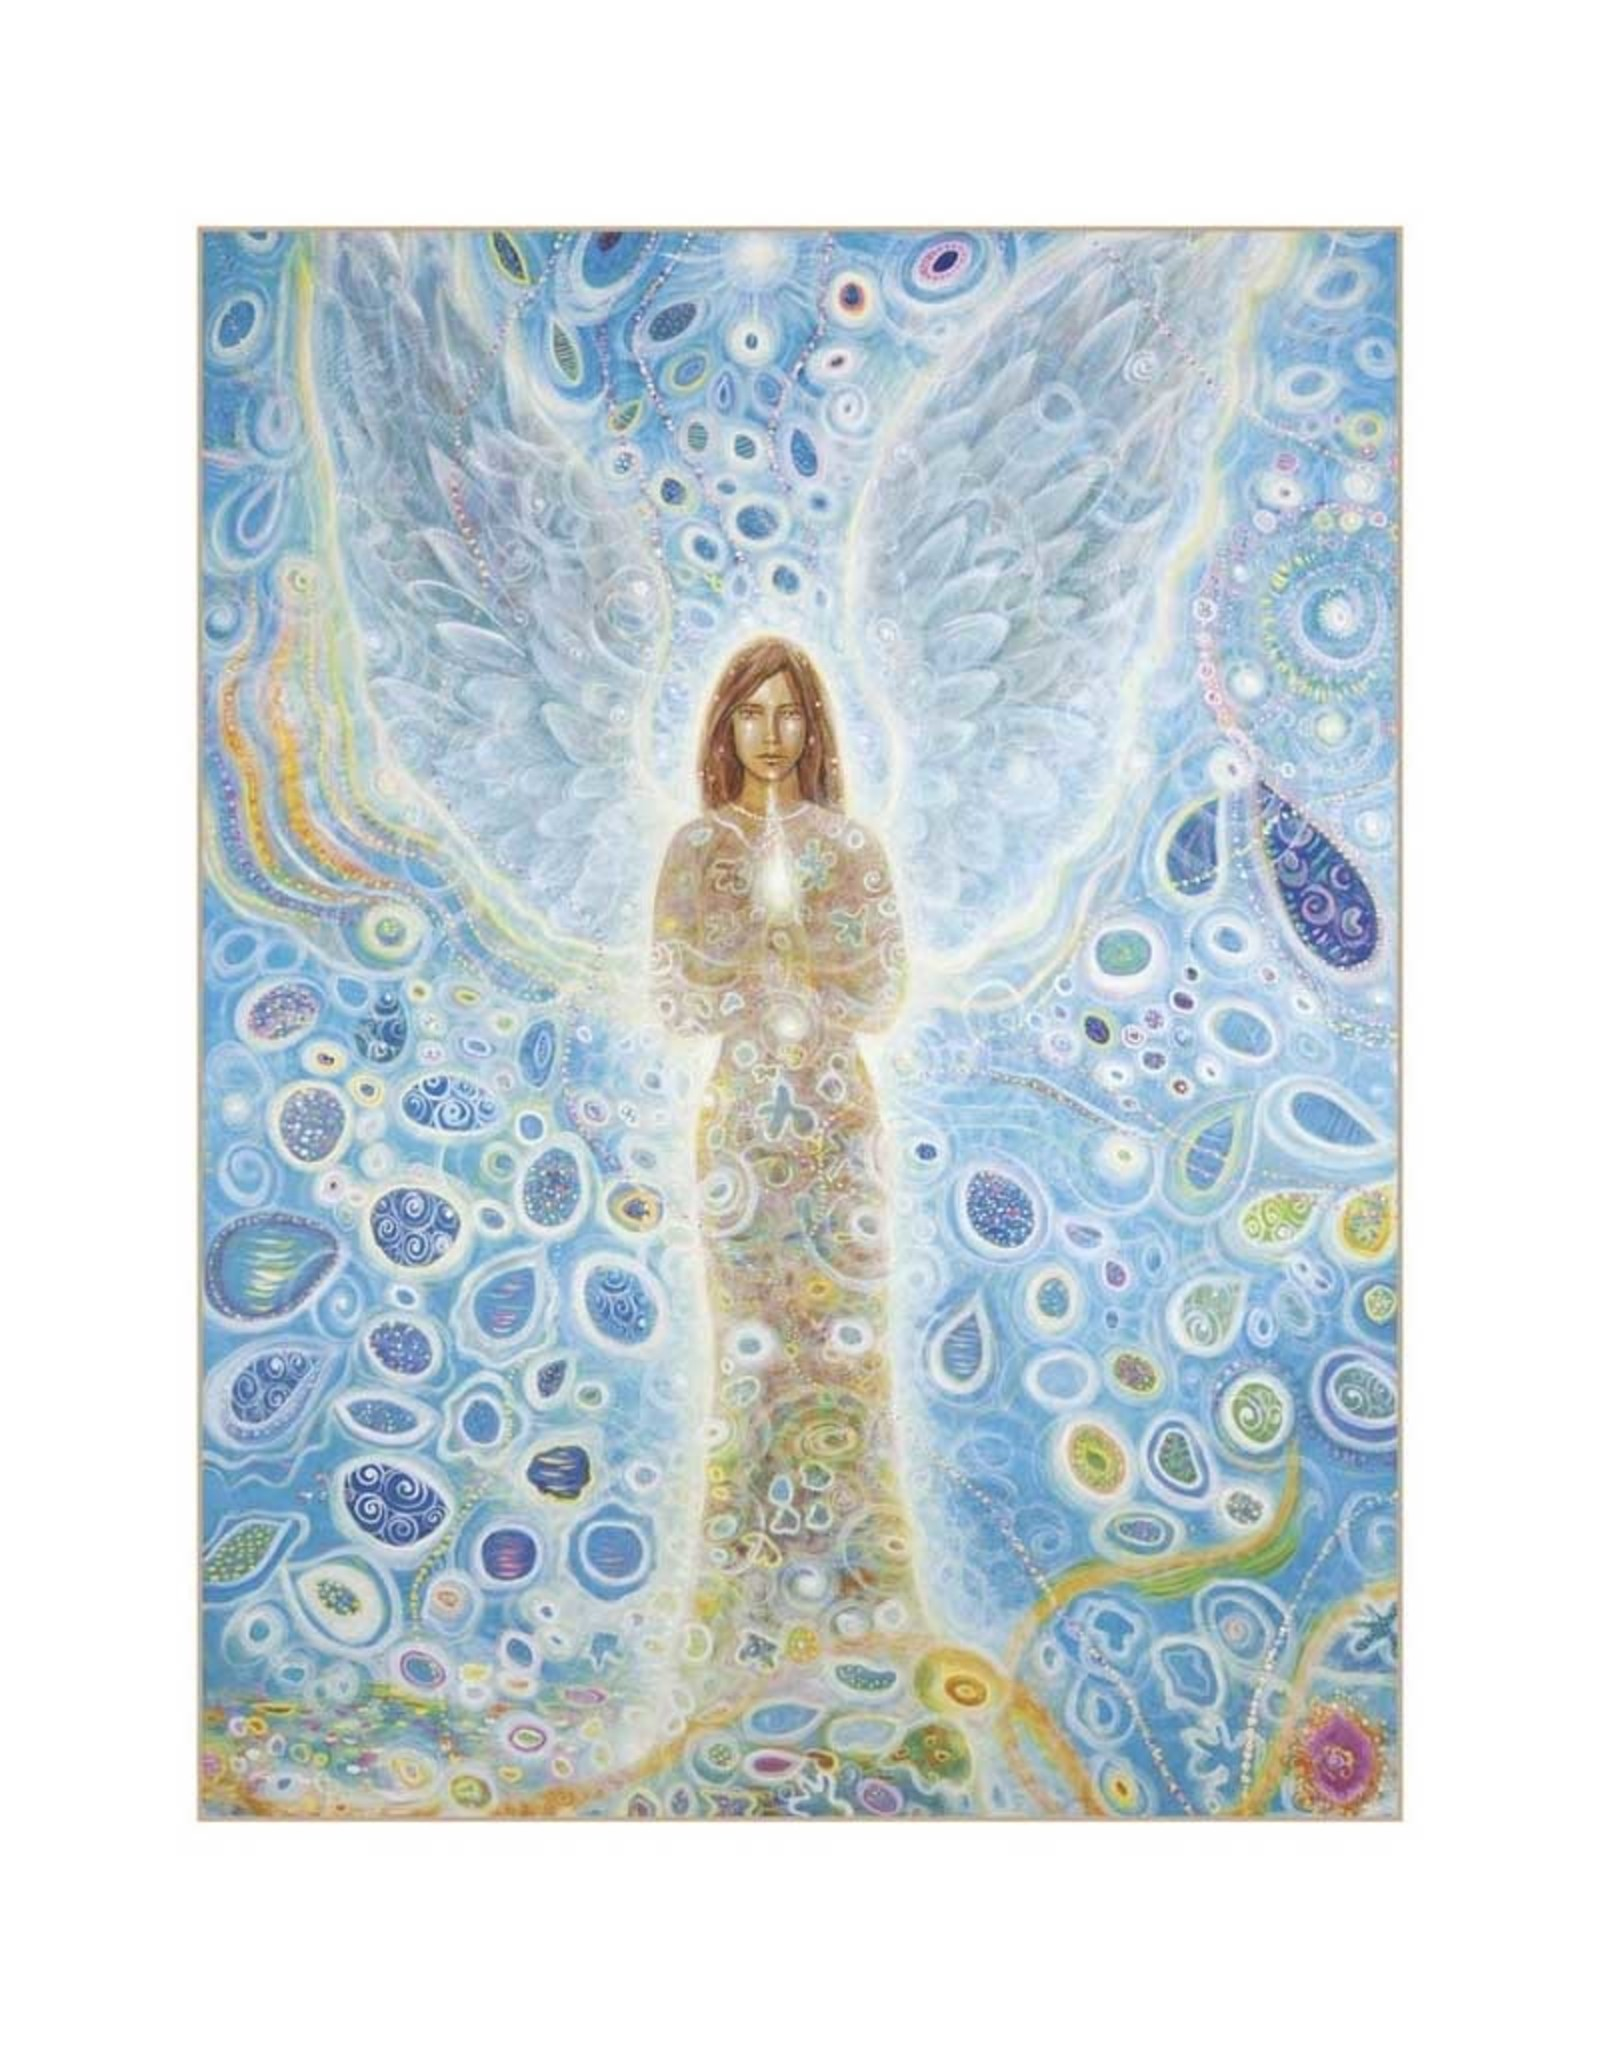 Toni Carmine Salerno Angels Journal by Toni Carmine Salerno